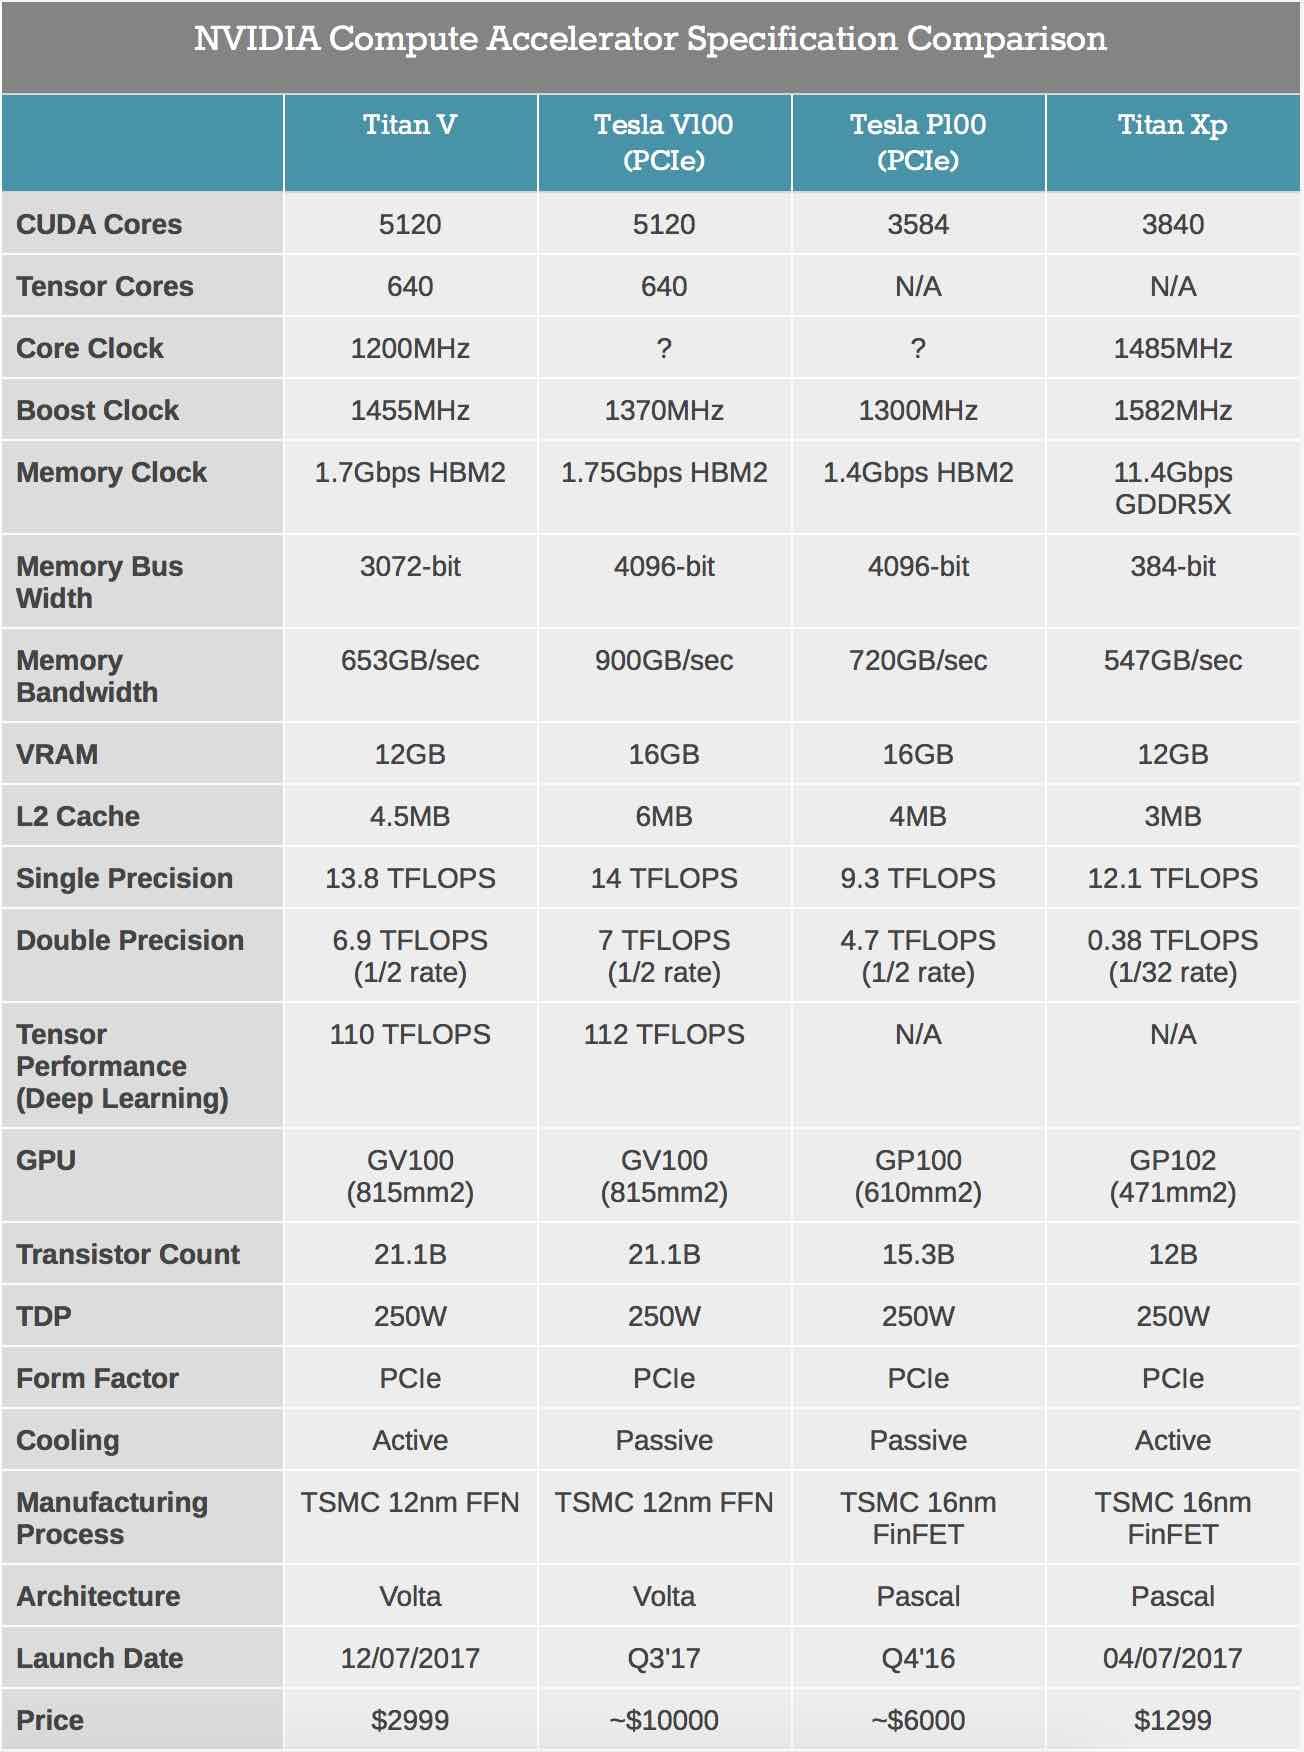 nvidia titan v v100 volta pascal xp comparaison